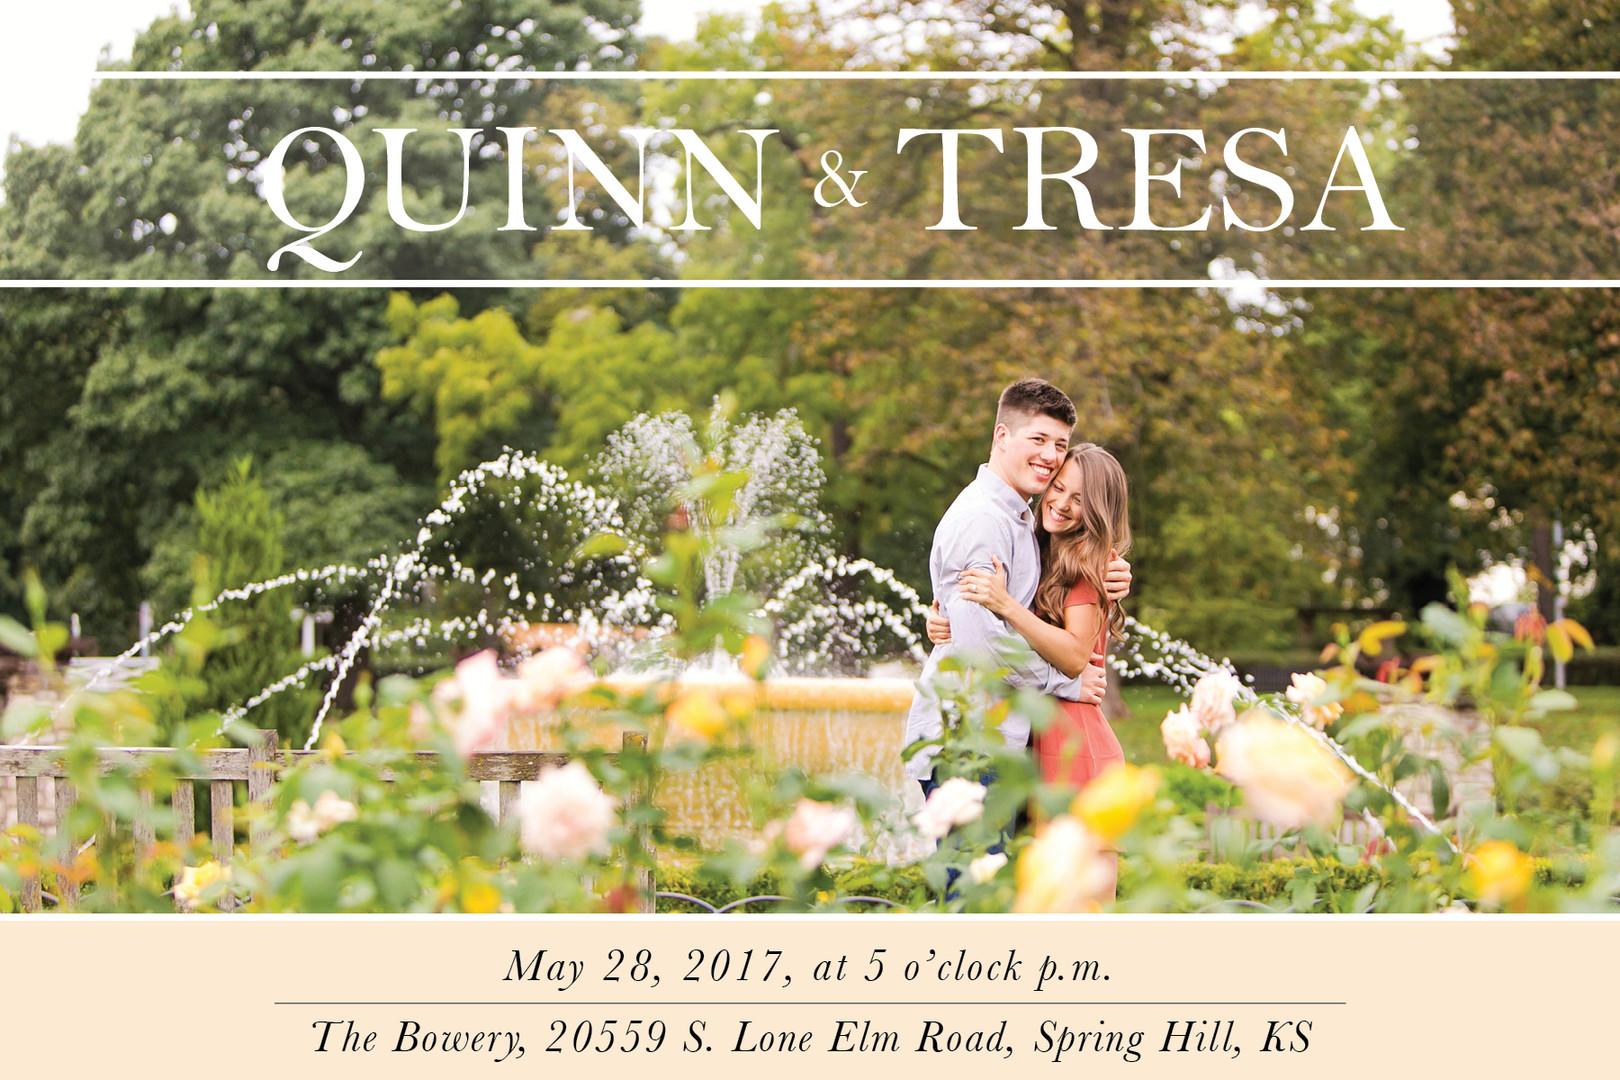 Quinn & Tresa iwedding invitation